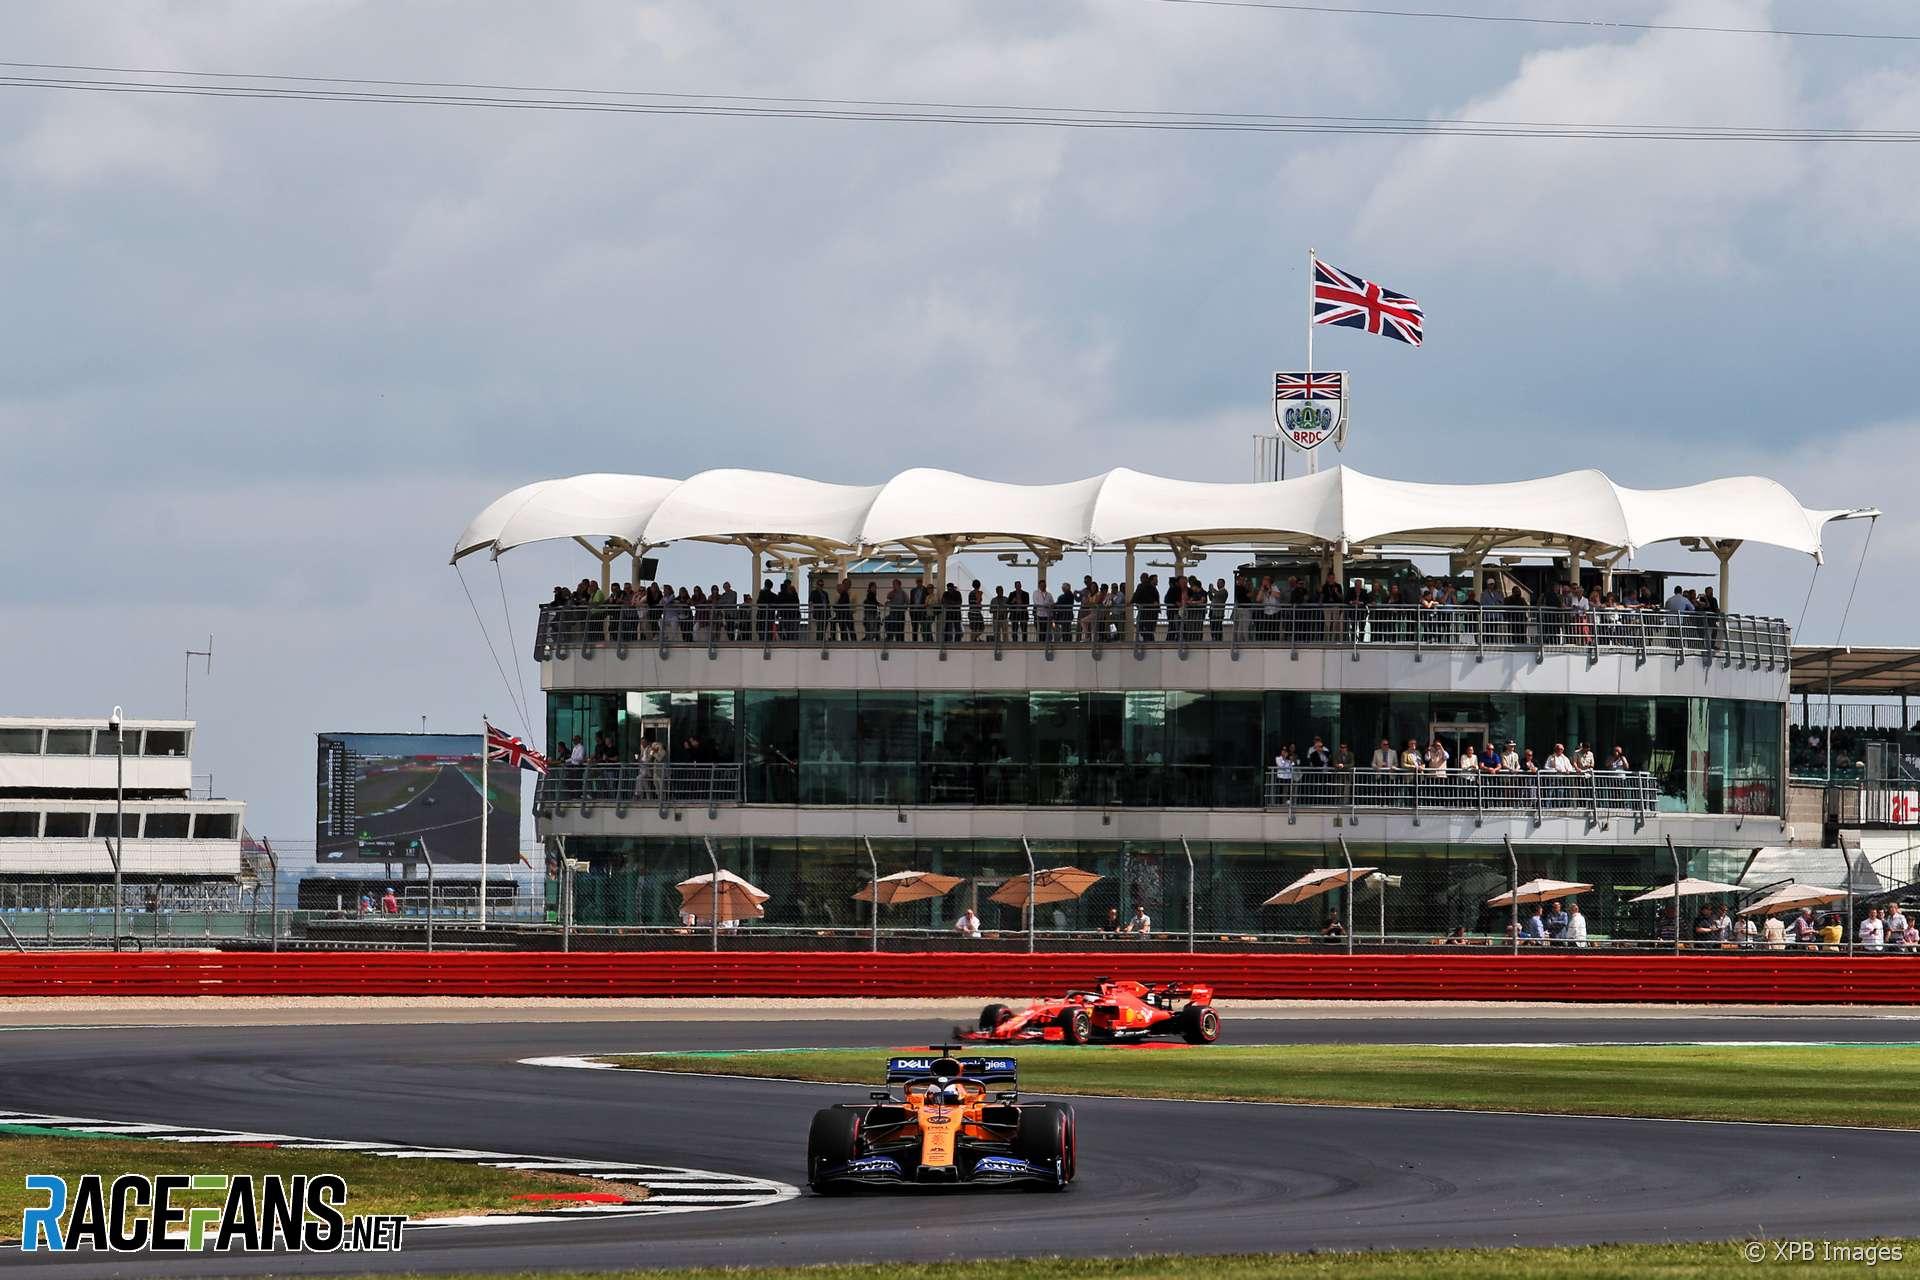 Carlos Sainz Jnr, McLaren, Silverstone, 2019